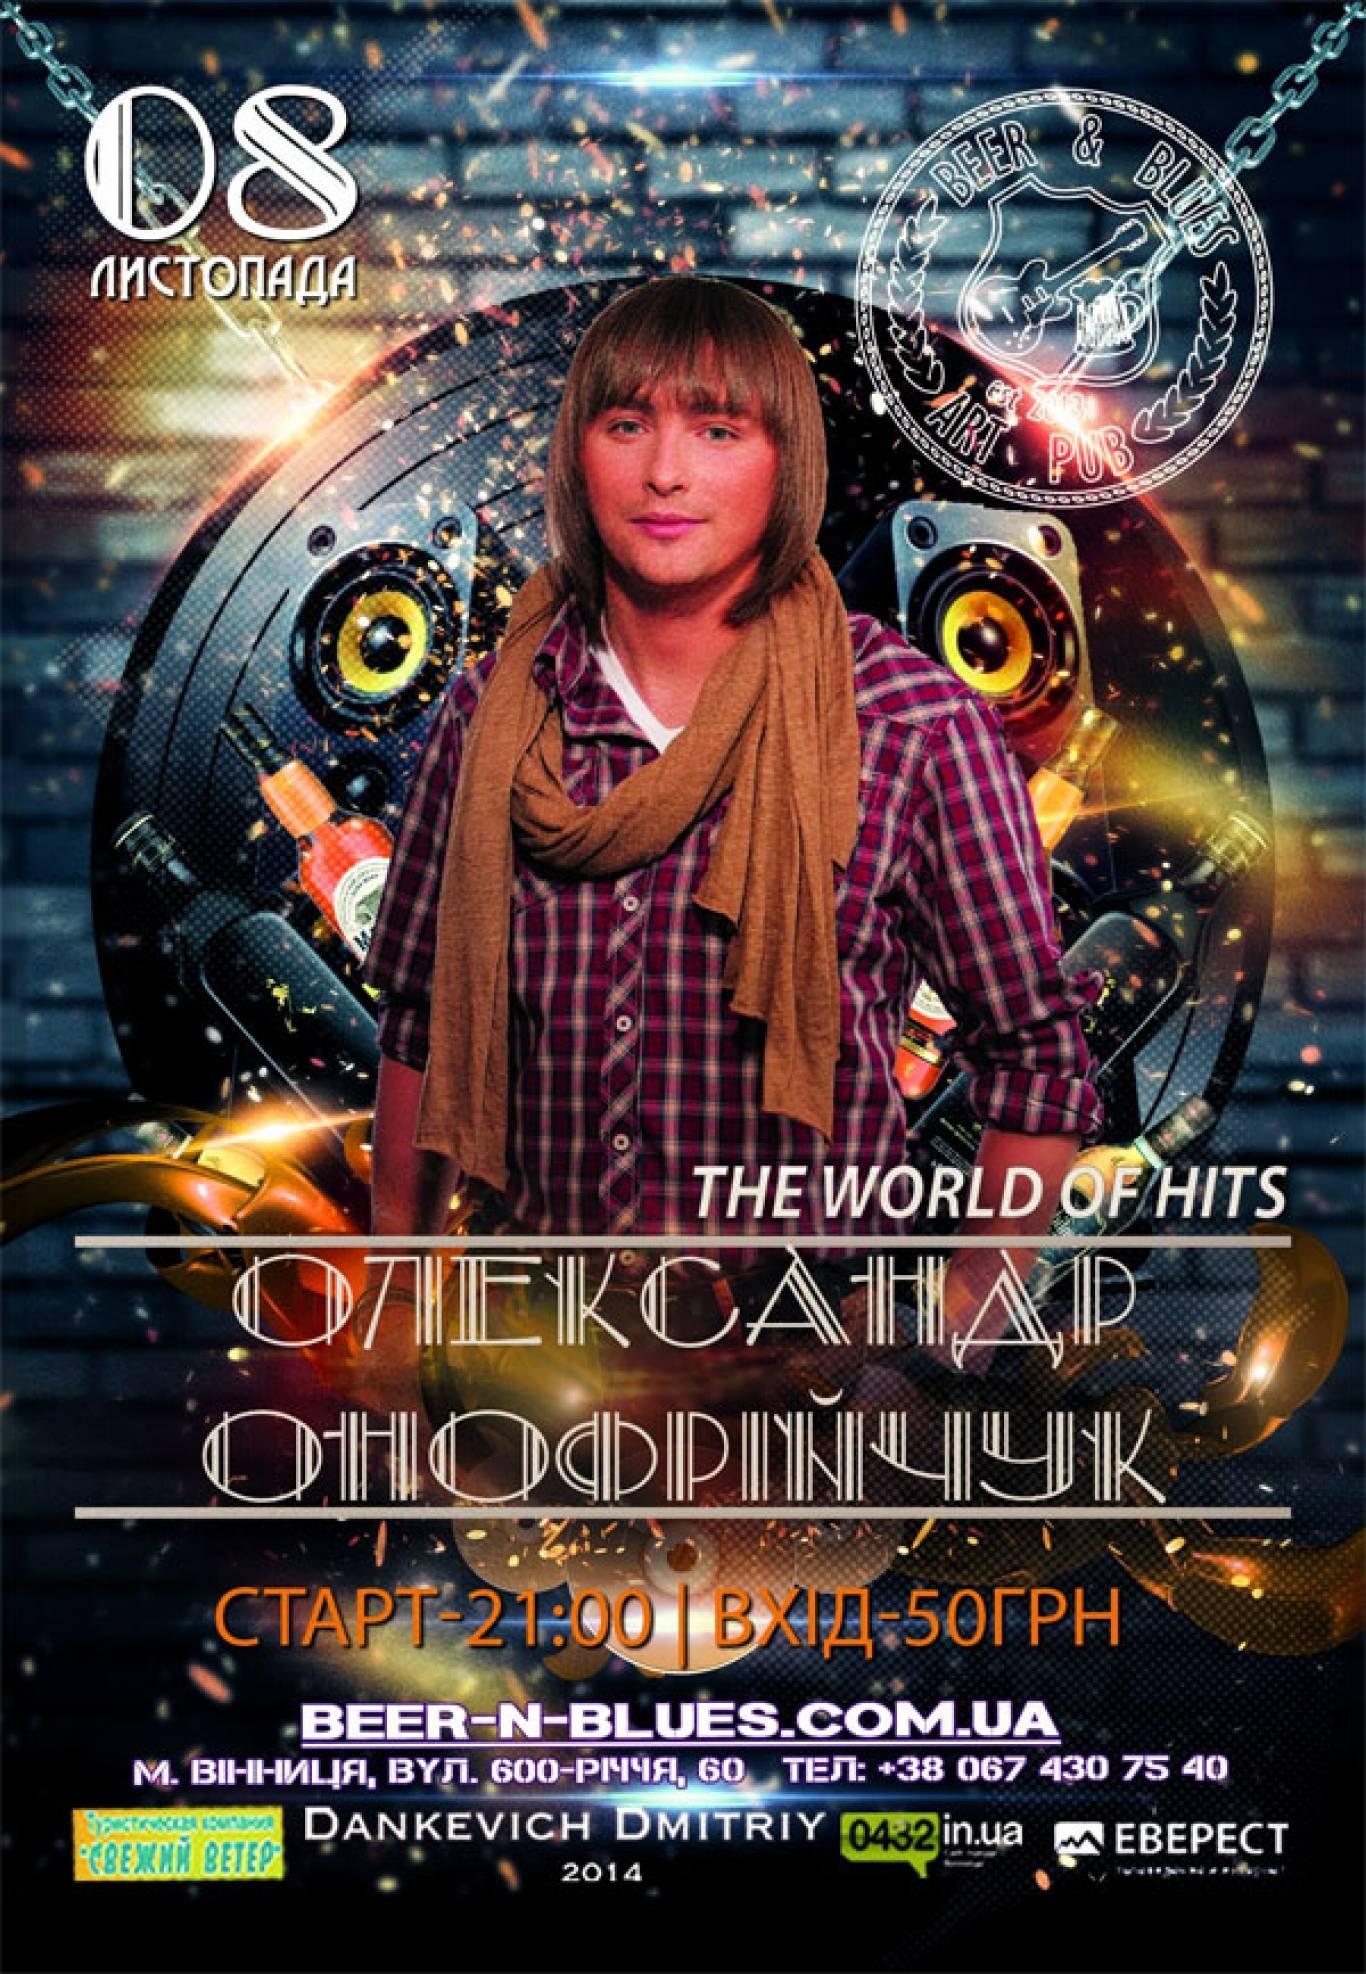 Олександр Онофрійчук з концертом «The world of hits»